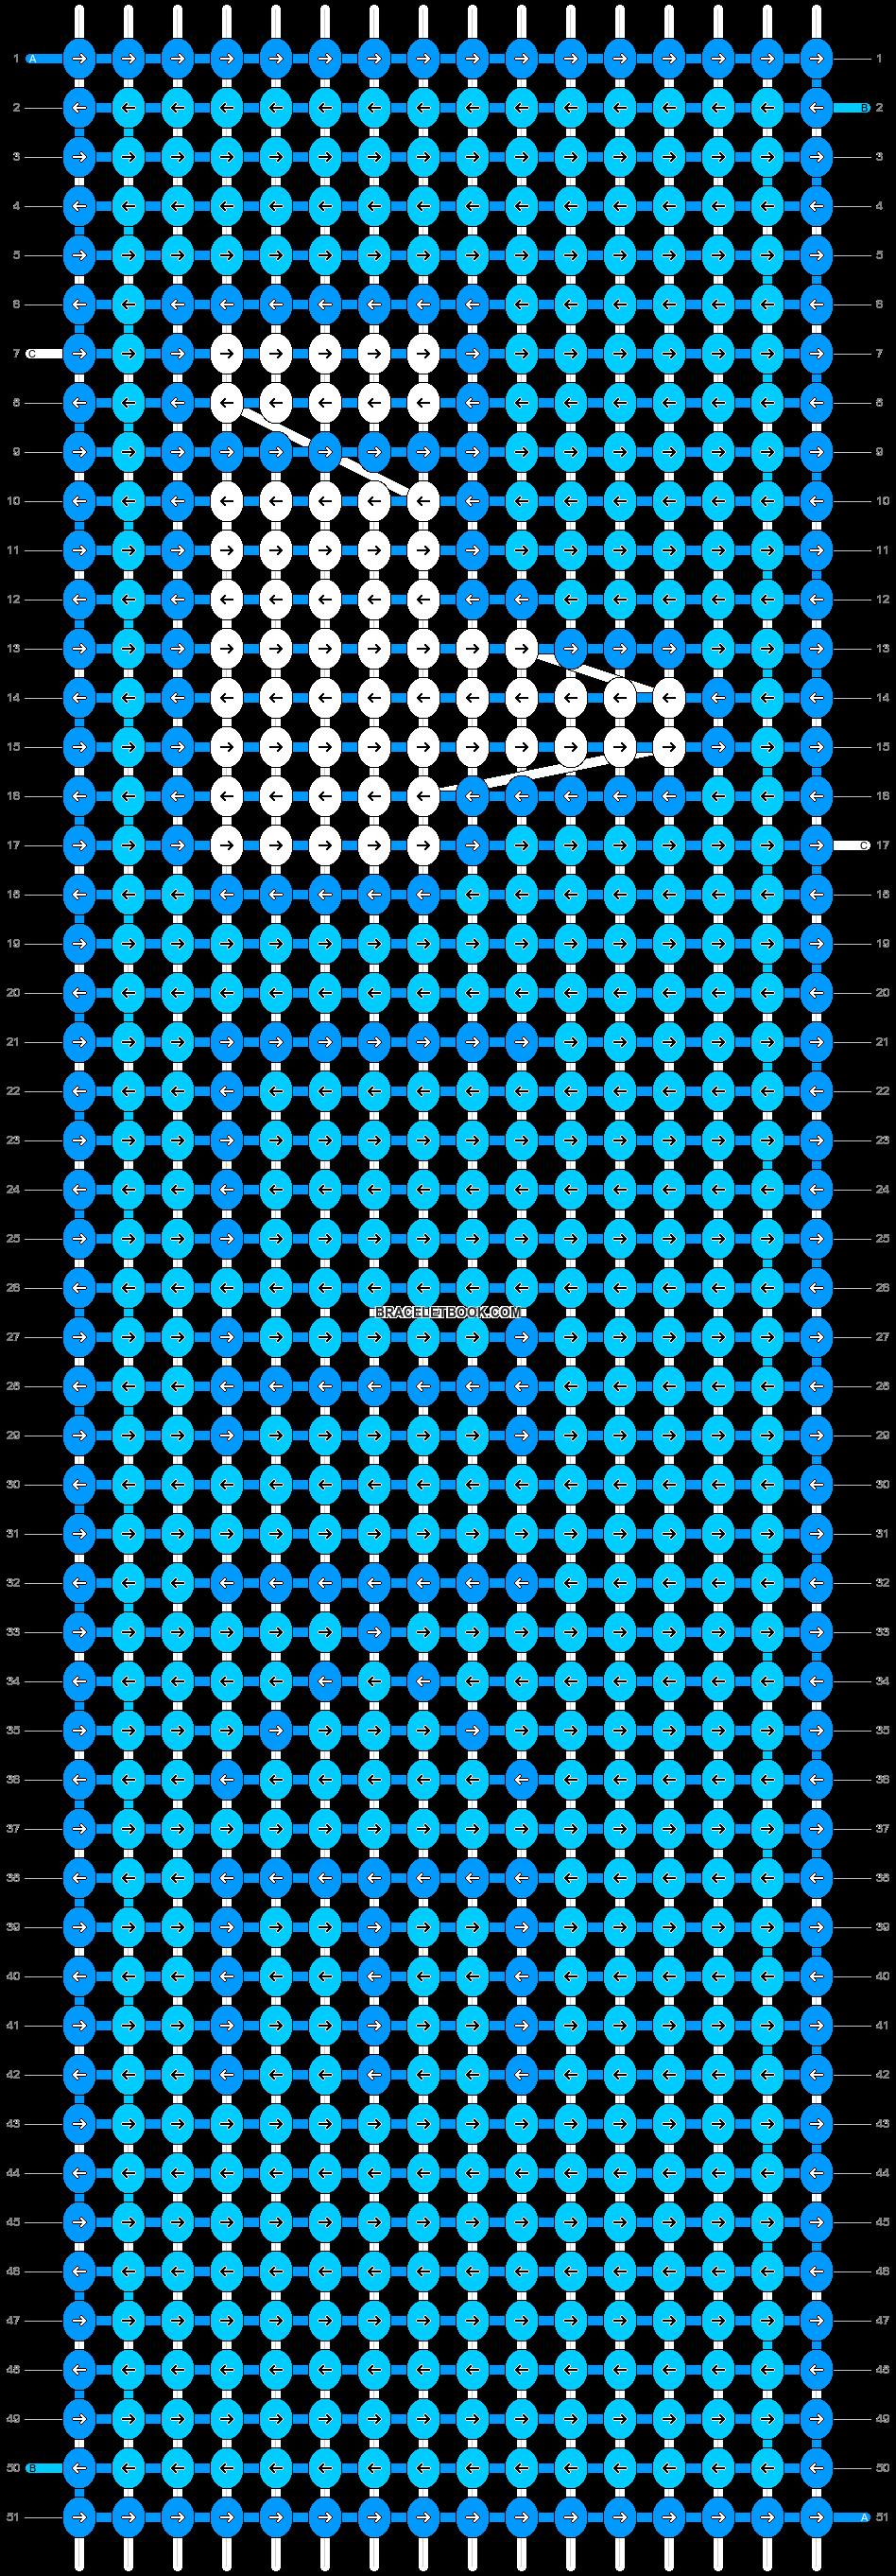 Alpha pattern #11665 pattern